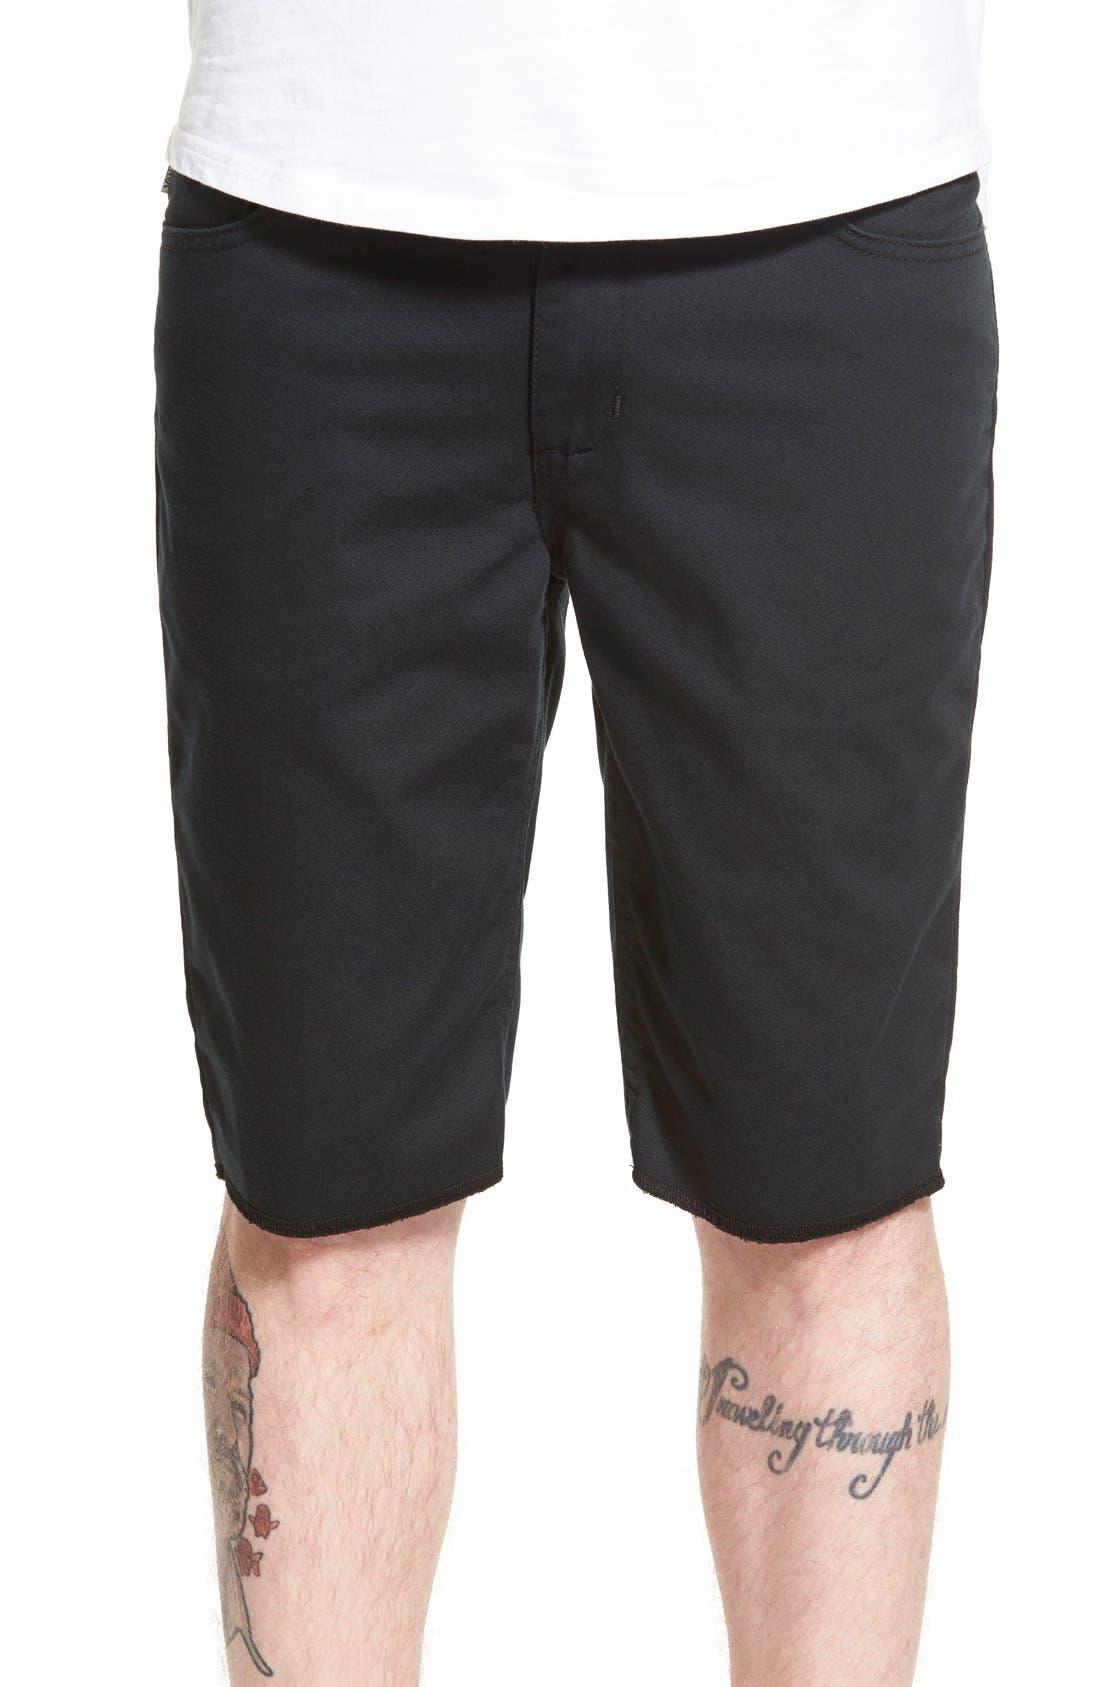 'Covina II - Anthony Van Engelen' Twill Shorts,                             Main thumbnail 1, color,                             Black